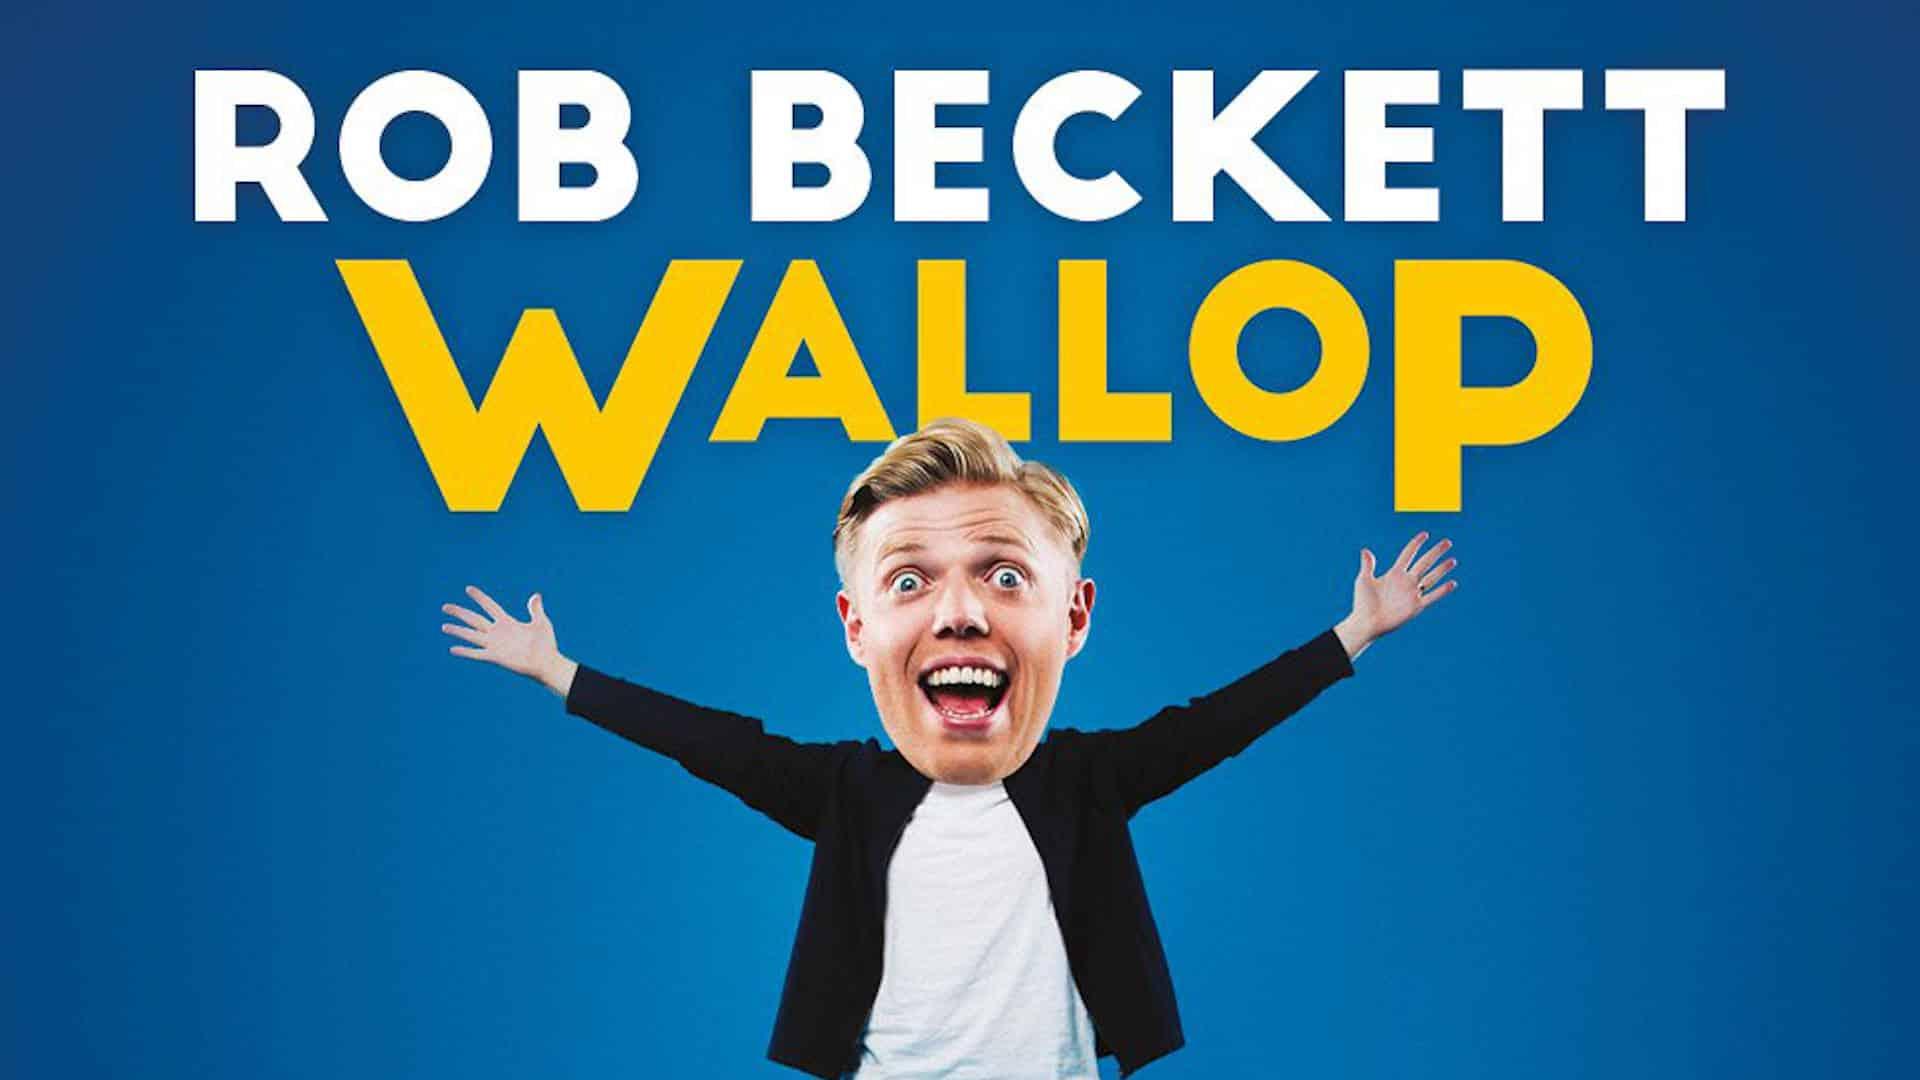 Rob Becket's Wallop show advert